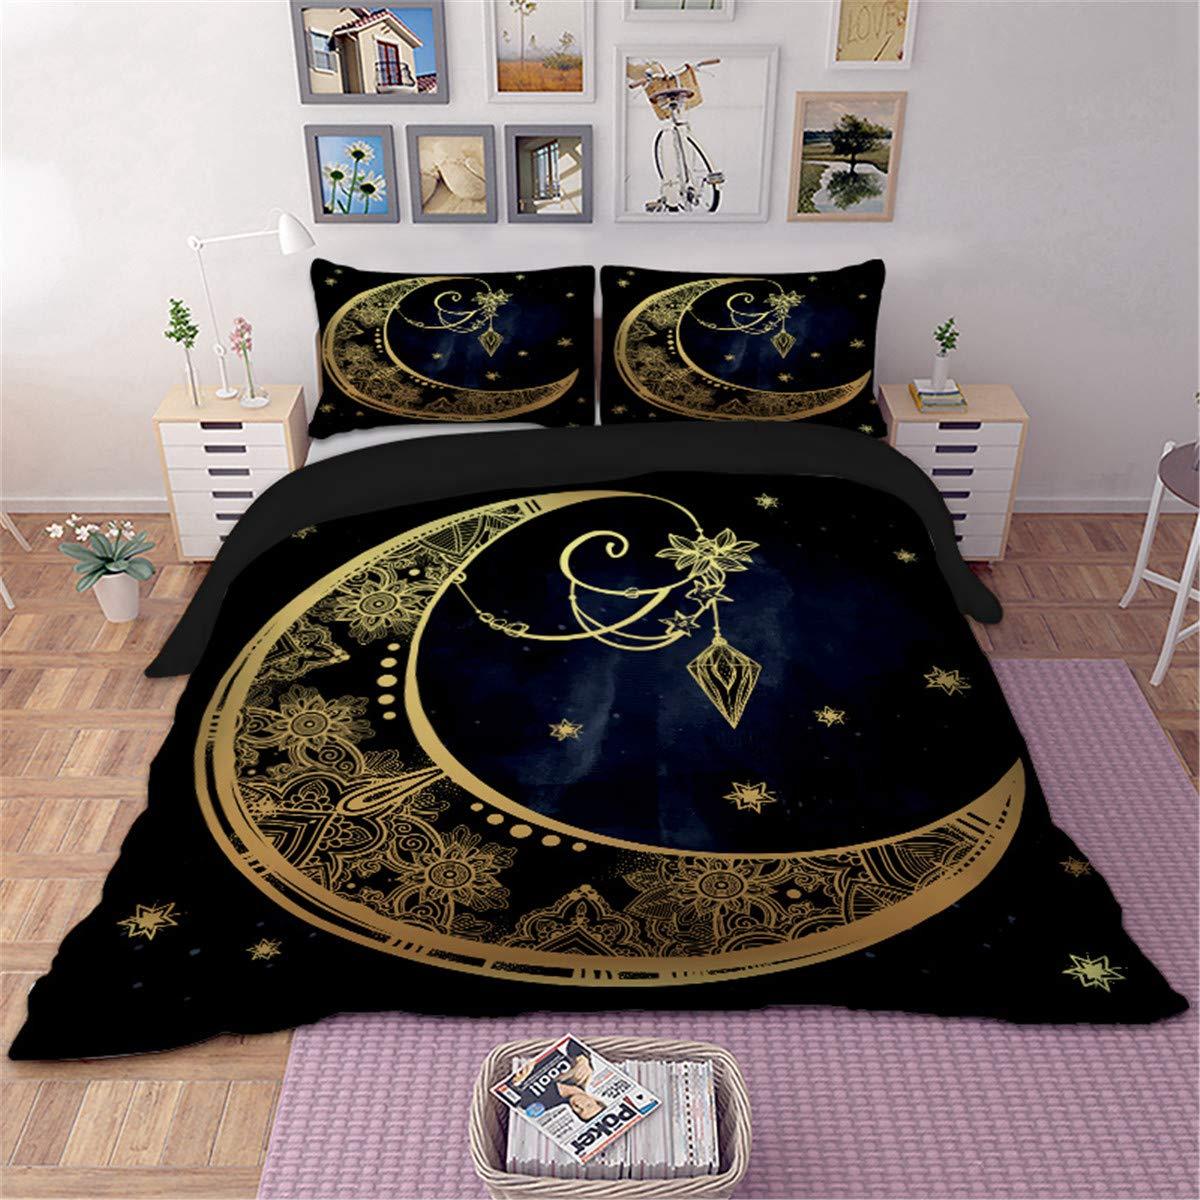 Mandala Bedding Set 3D Golden Moon Printed Duvet Cover for Kids Teens Adults Soft Microfiber 3 Pieces Comforter Duvet Cover with Zipper Closure and Corner Ties (Navy Blue, Queen)